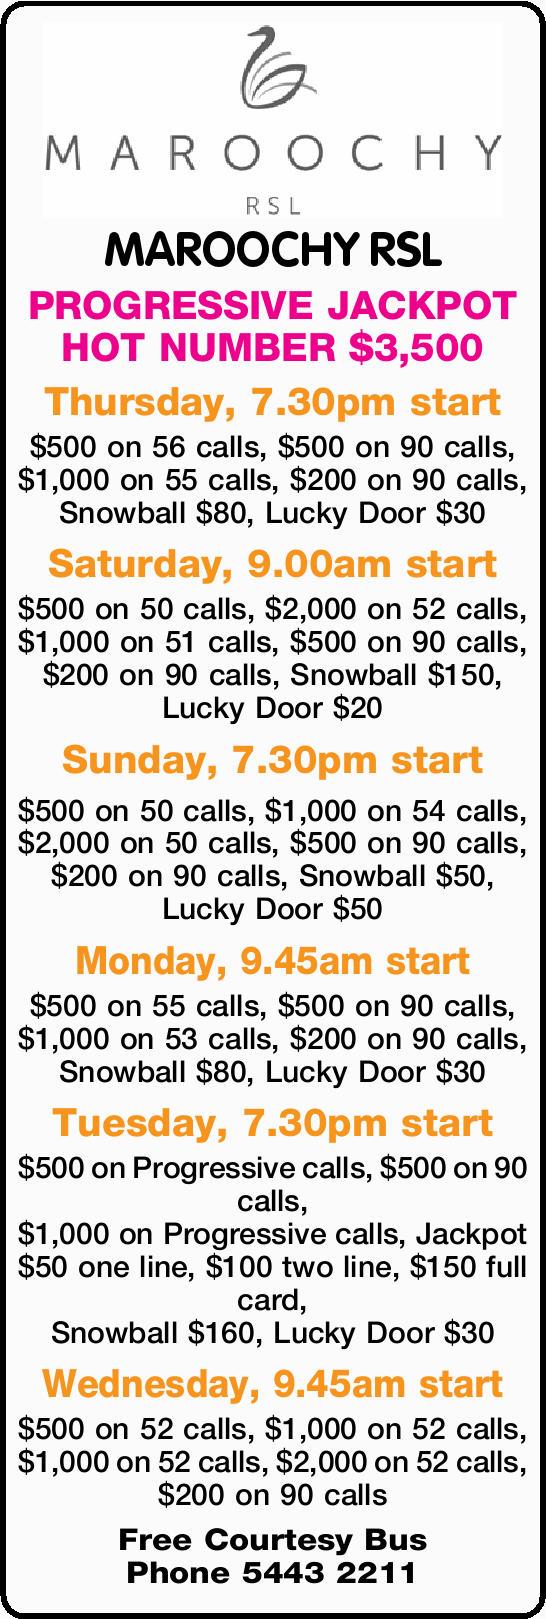 MAROOCHY RSL PROGRESSIVE JACKPOT HOT NUMBER $3,500 Thursday, 7.30pm start $500 on 56 calls, $500...